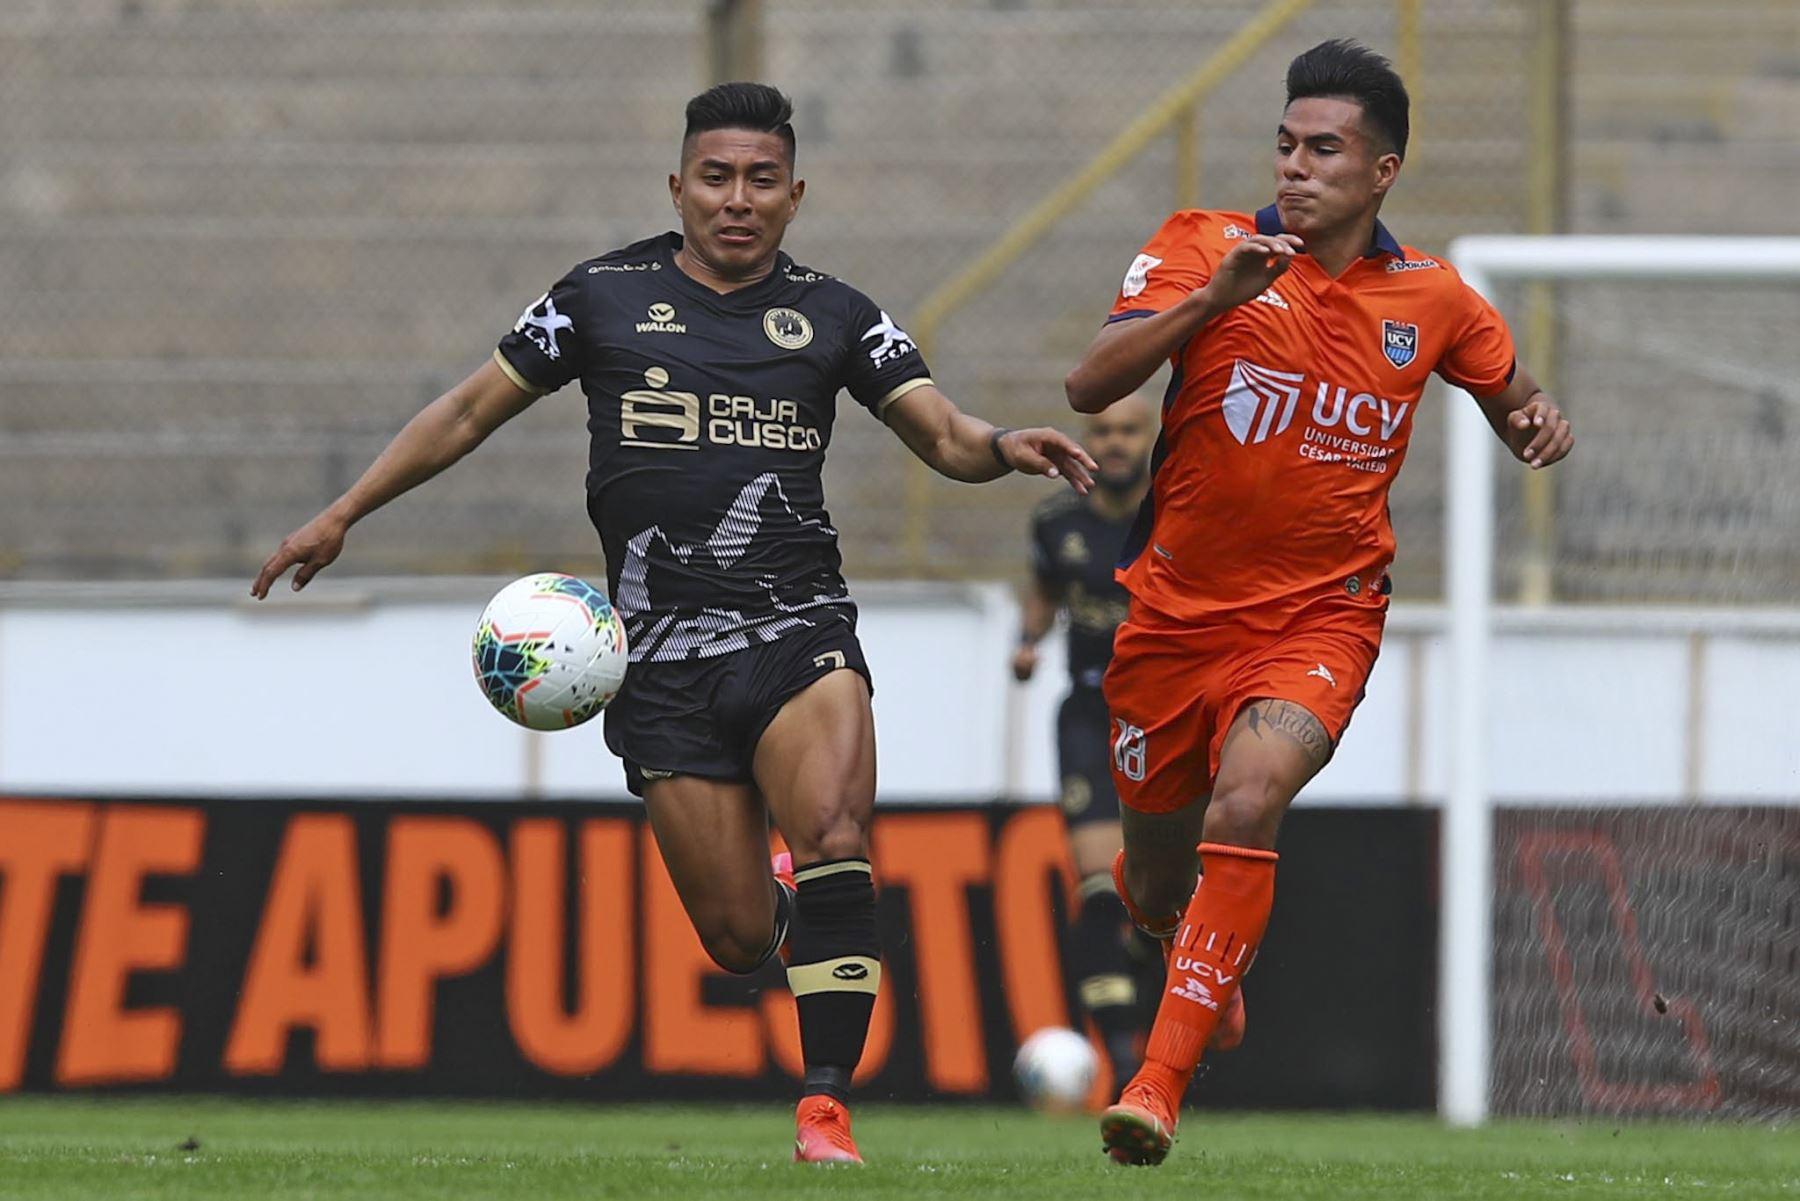 Universidad Cesar Vallejo se enfrenta a Cusco FC por la primera fecha de la Liga 1, en el estadio Monumental. Foto: Liga 1